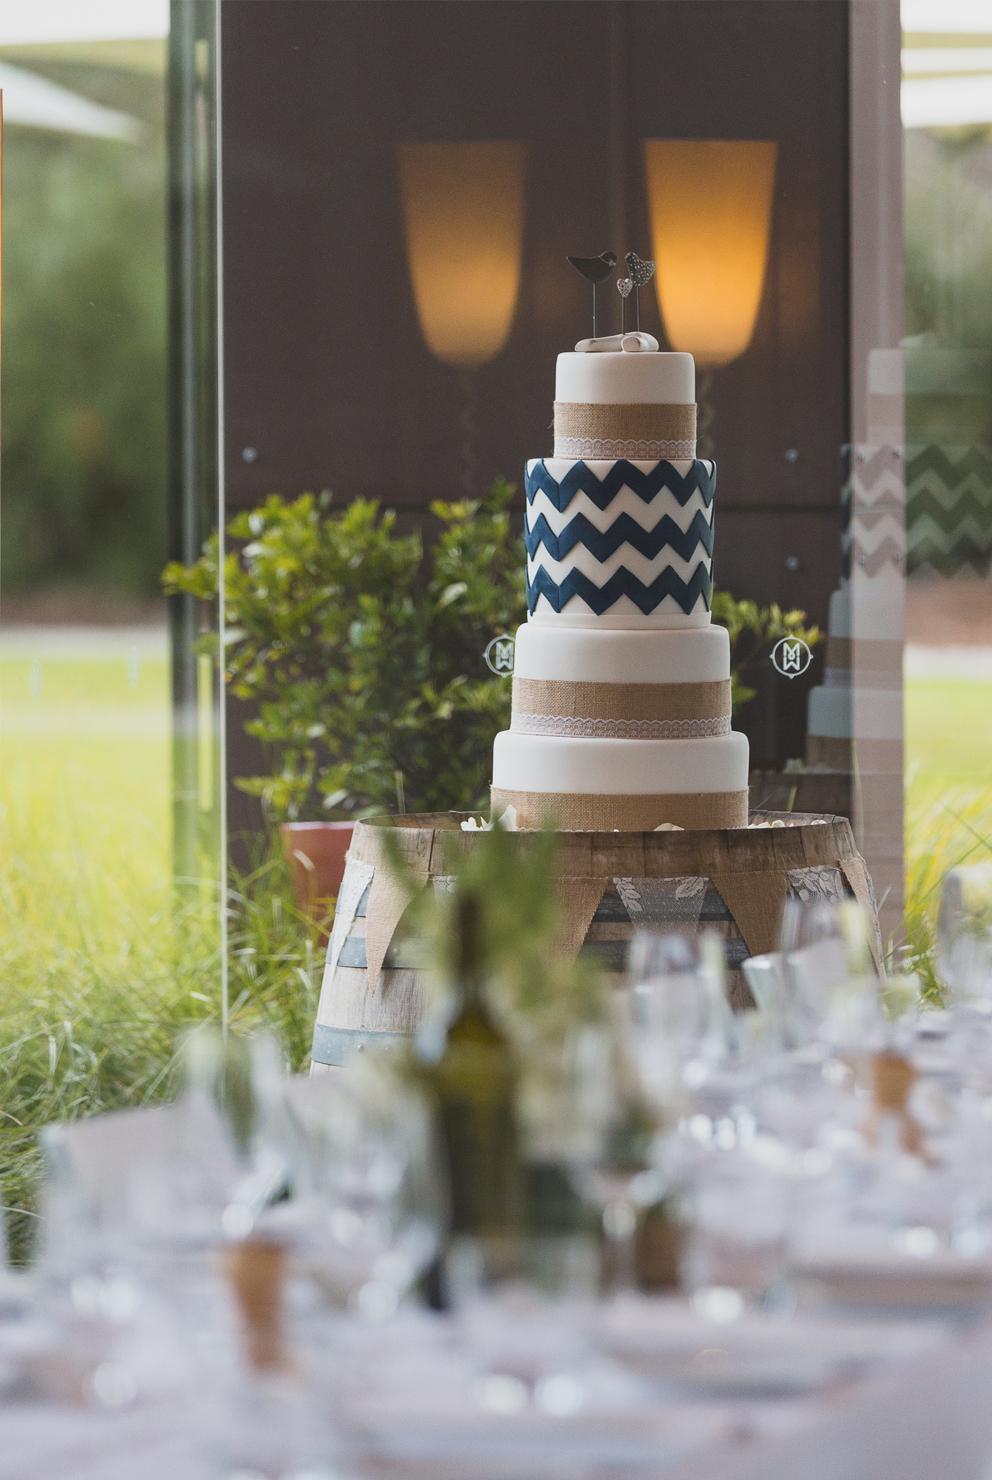 Yarra Valley Italian Restaurant_Wedding cake